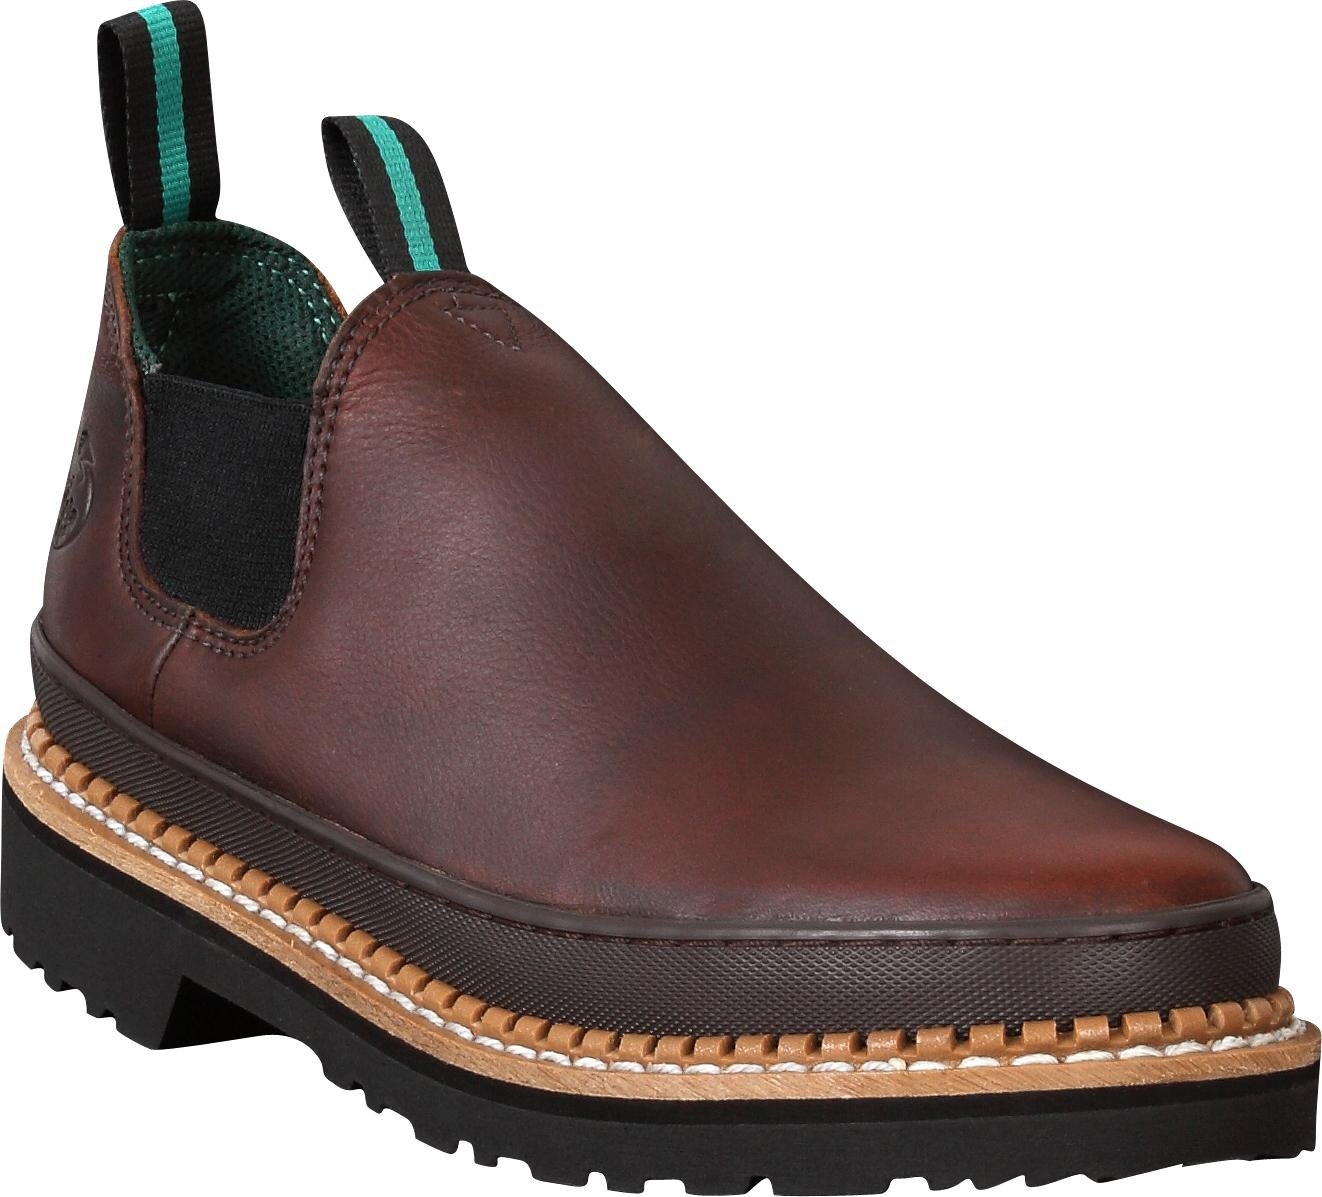 Georgia Giant Romeo Steel Toe Work ShoesGS-262 (W 9.5)